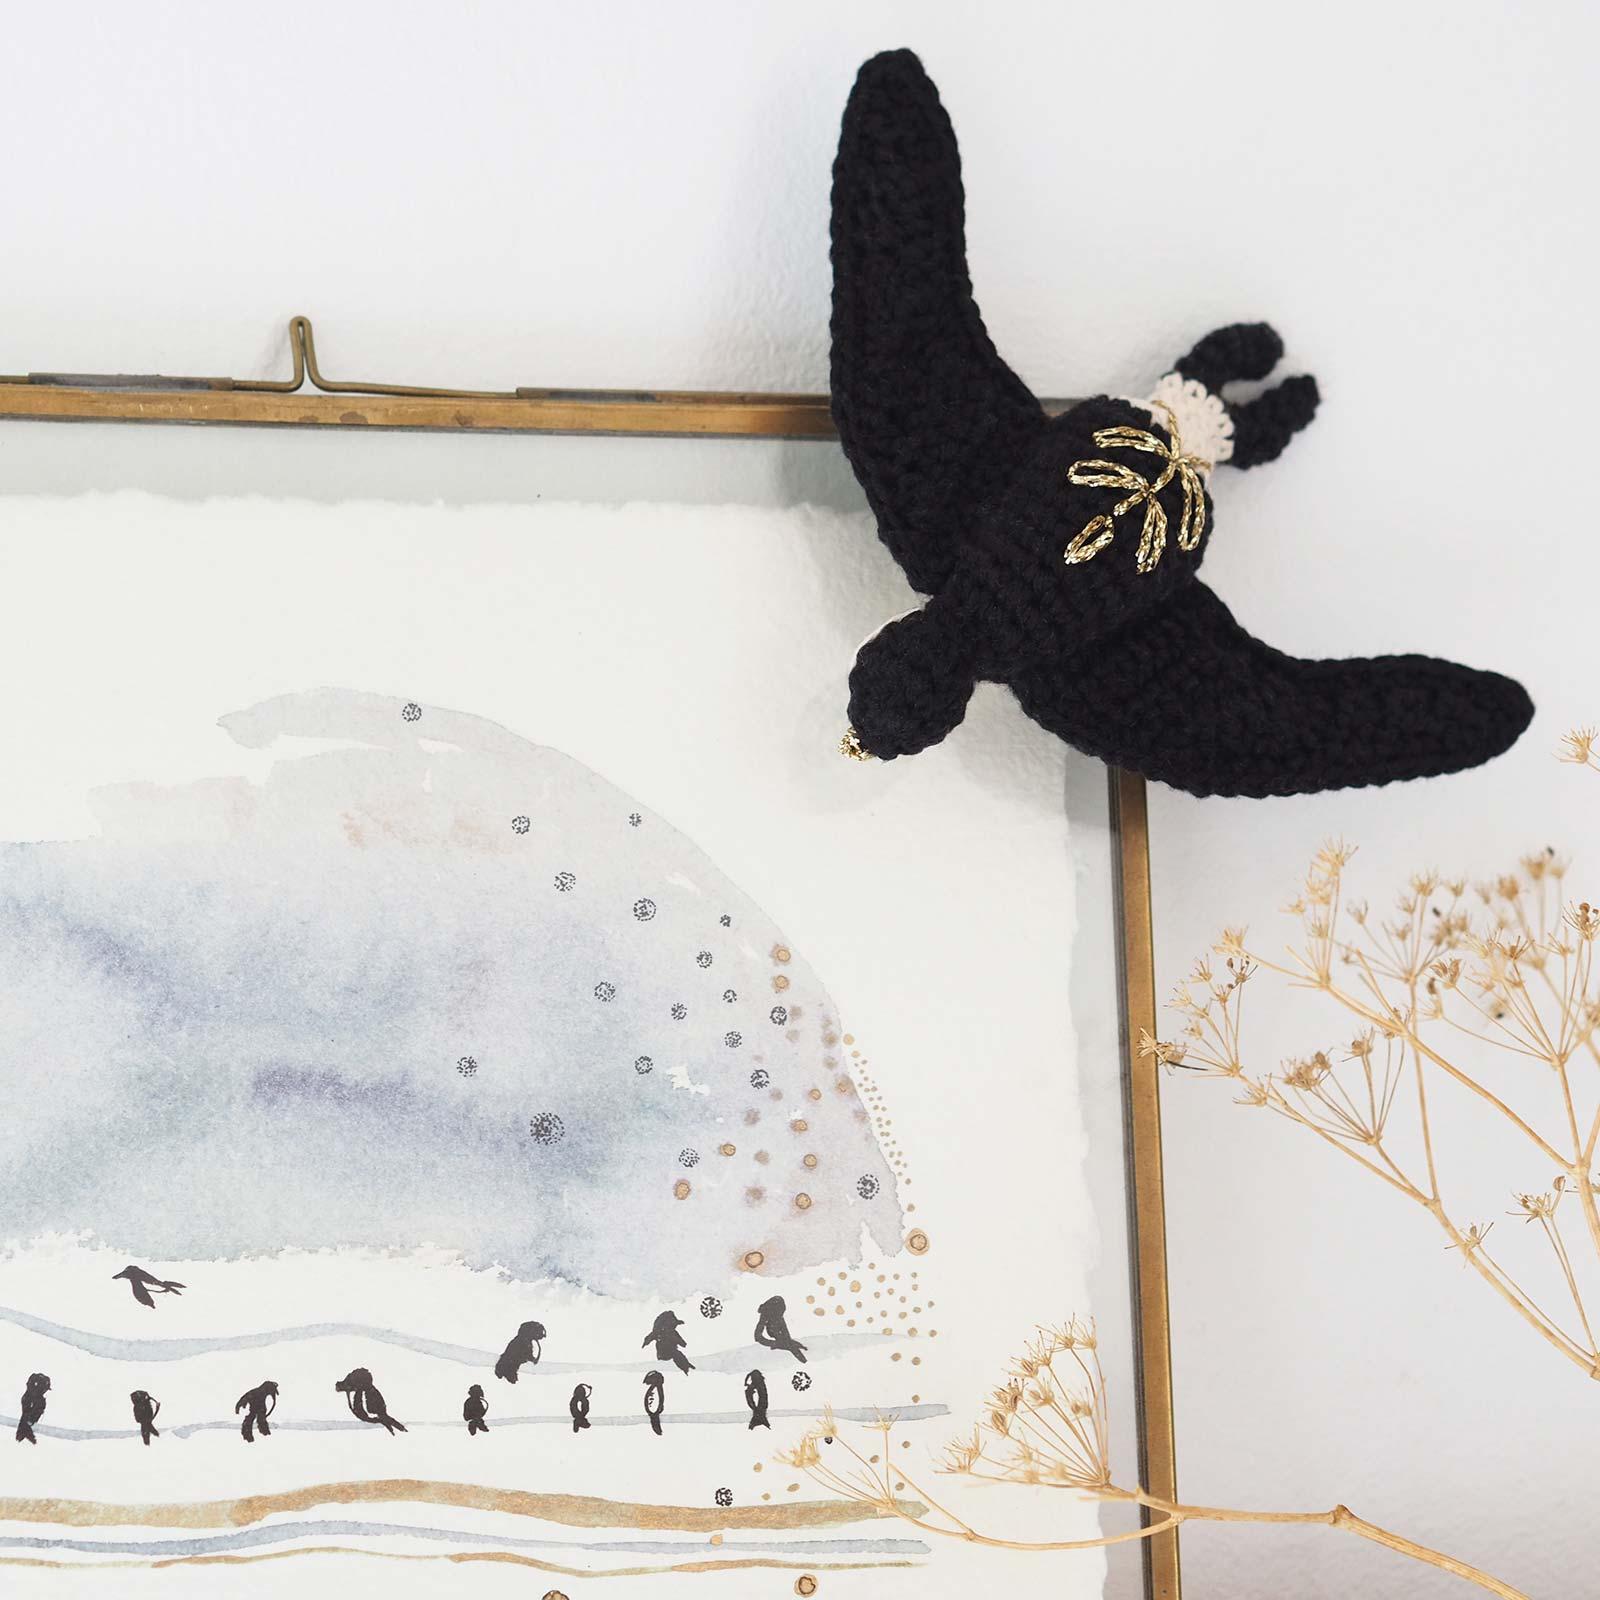 hirondelle-fenetre-crochet-decoration-diymelimelo-laboutiquedemelimelo